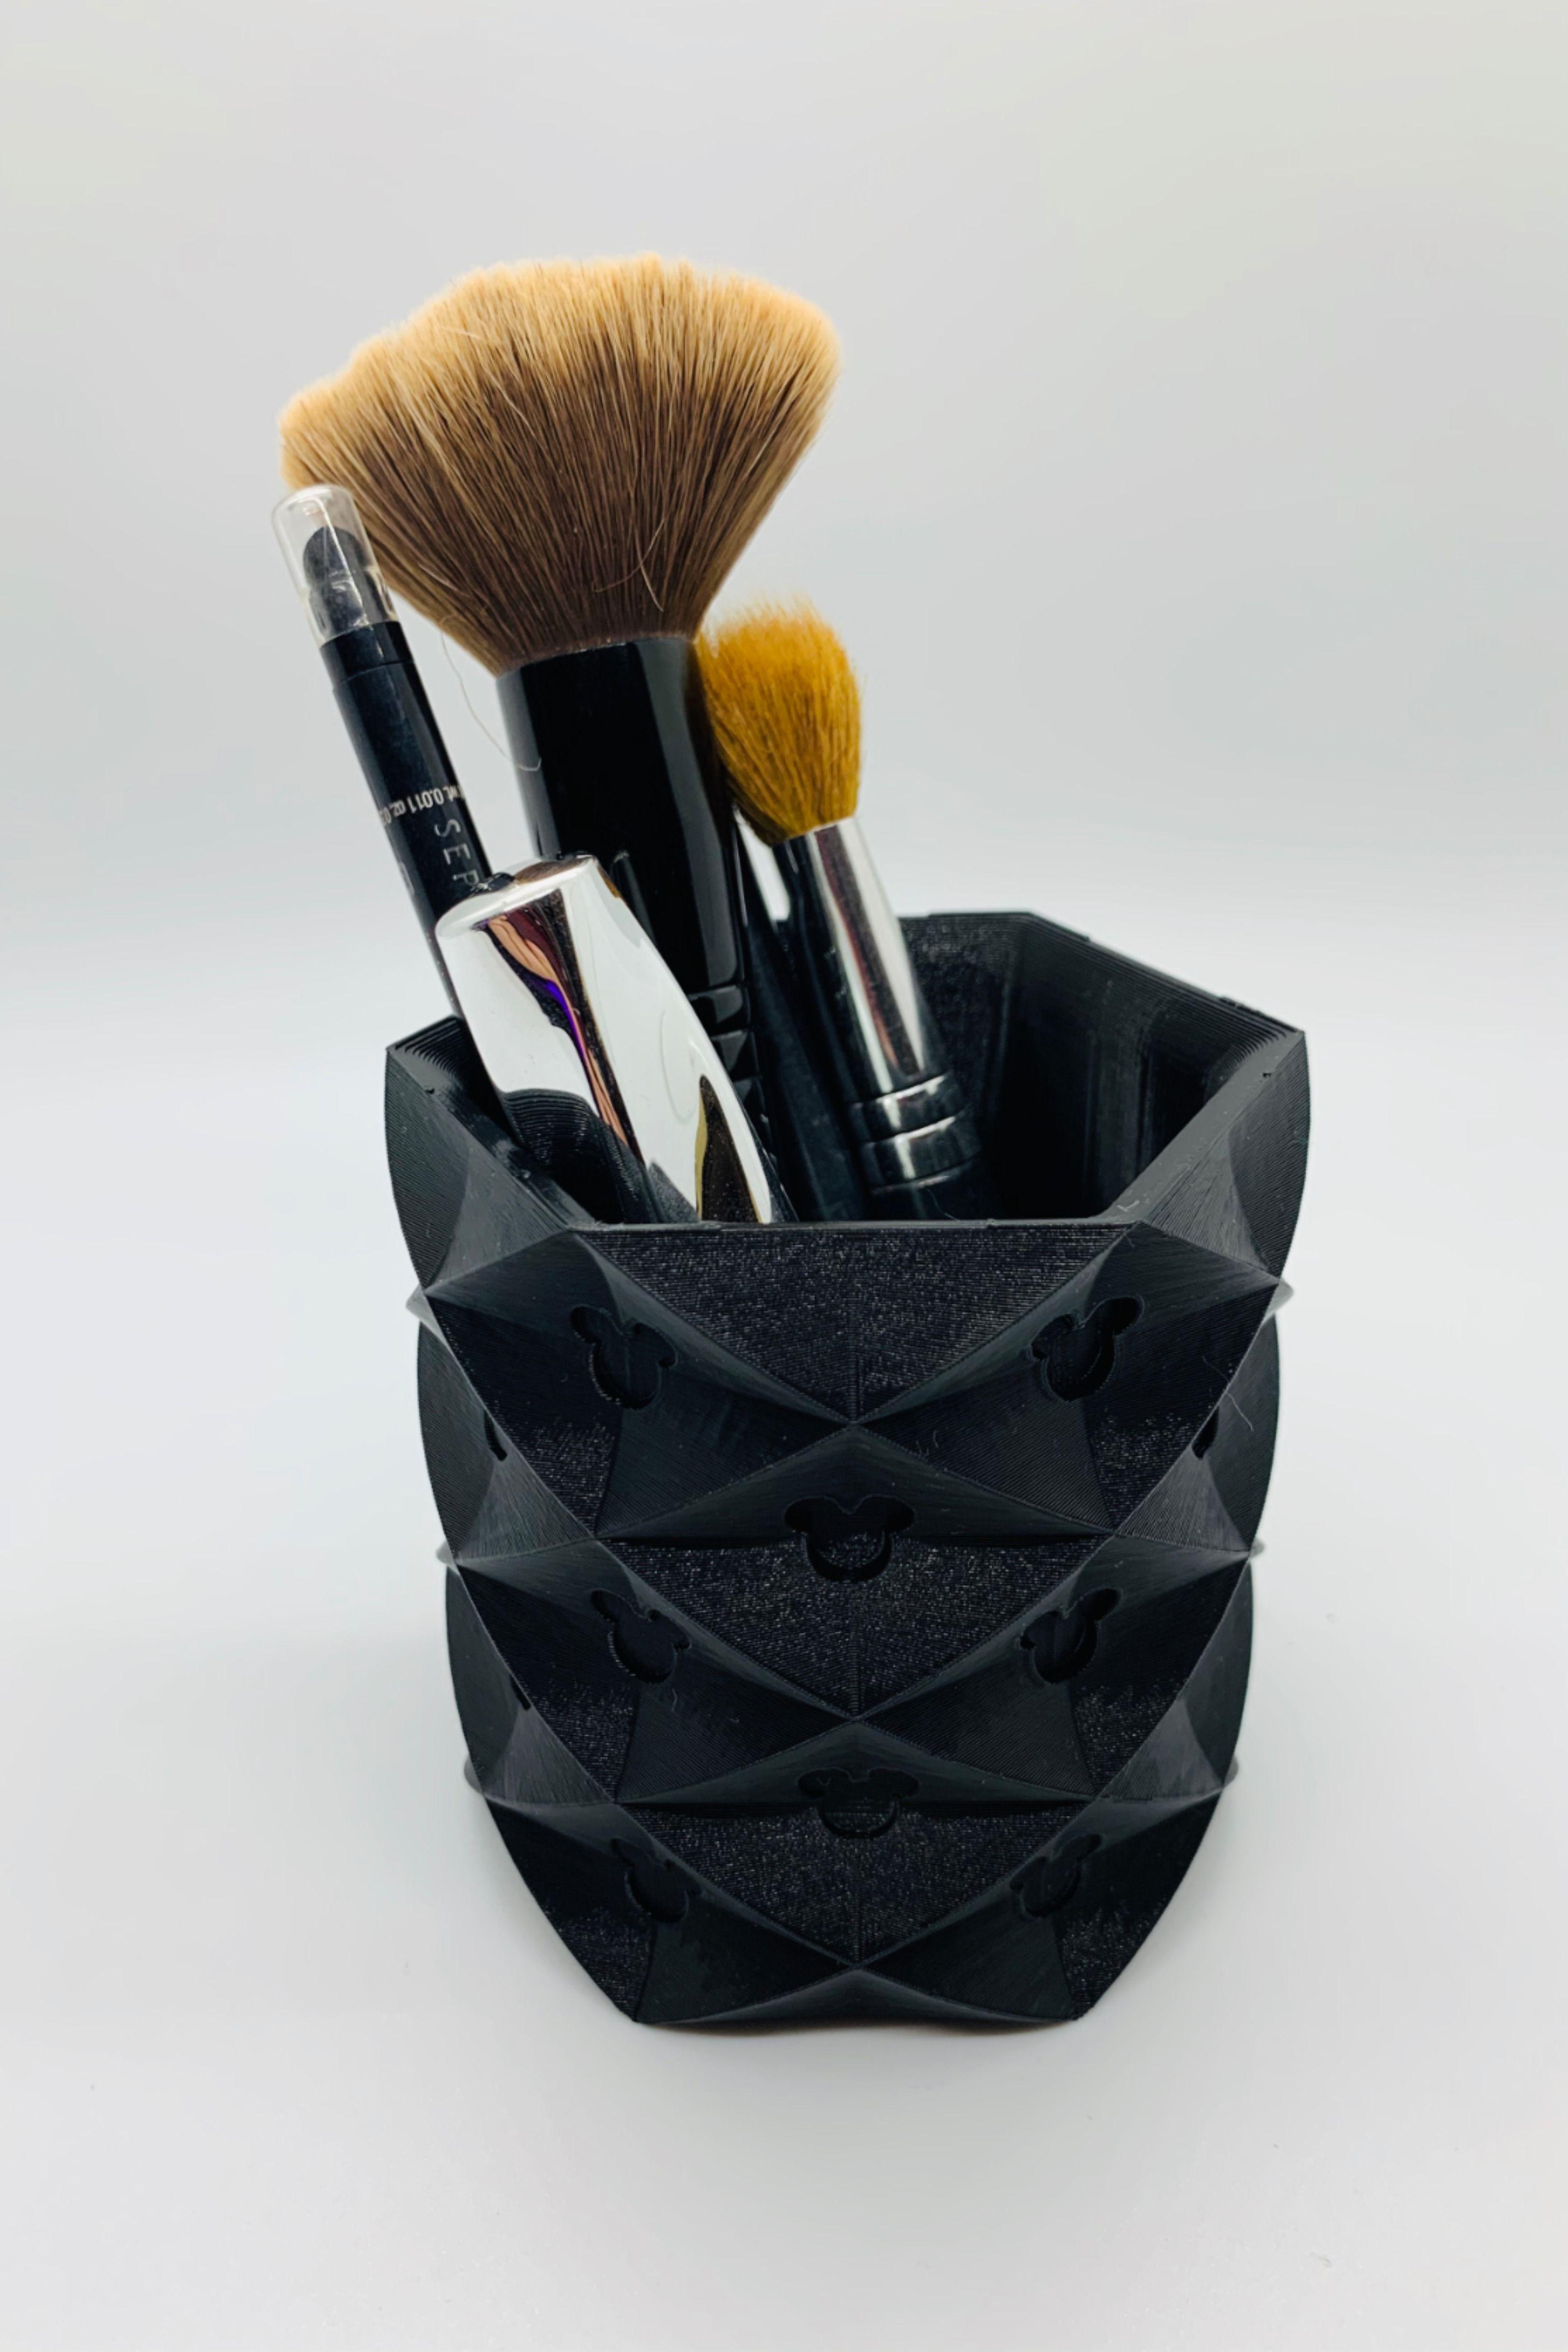 Disney Pen and Pencil Holder Makeup Brush Holder